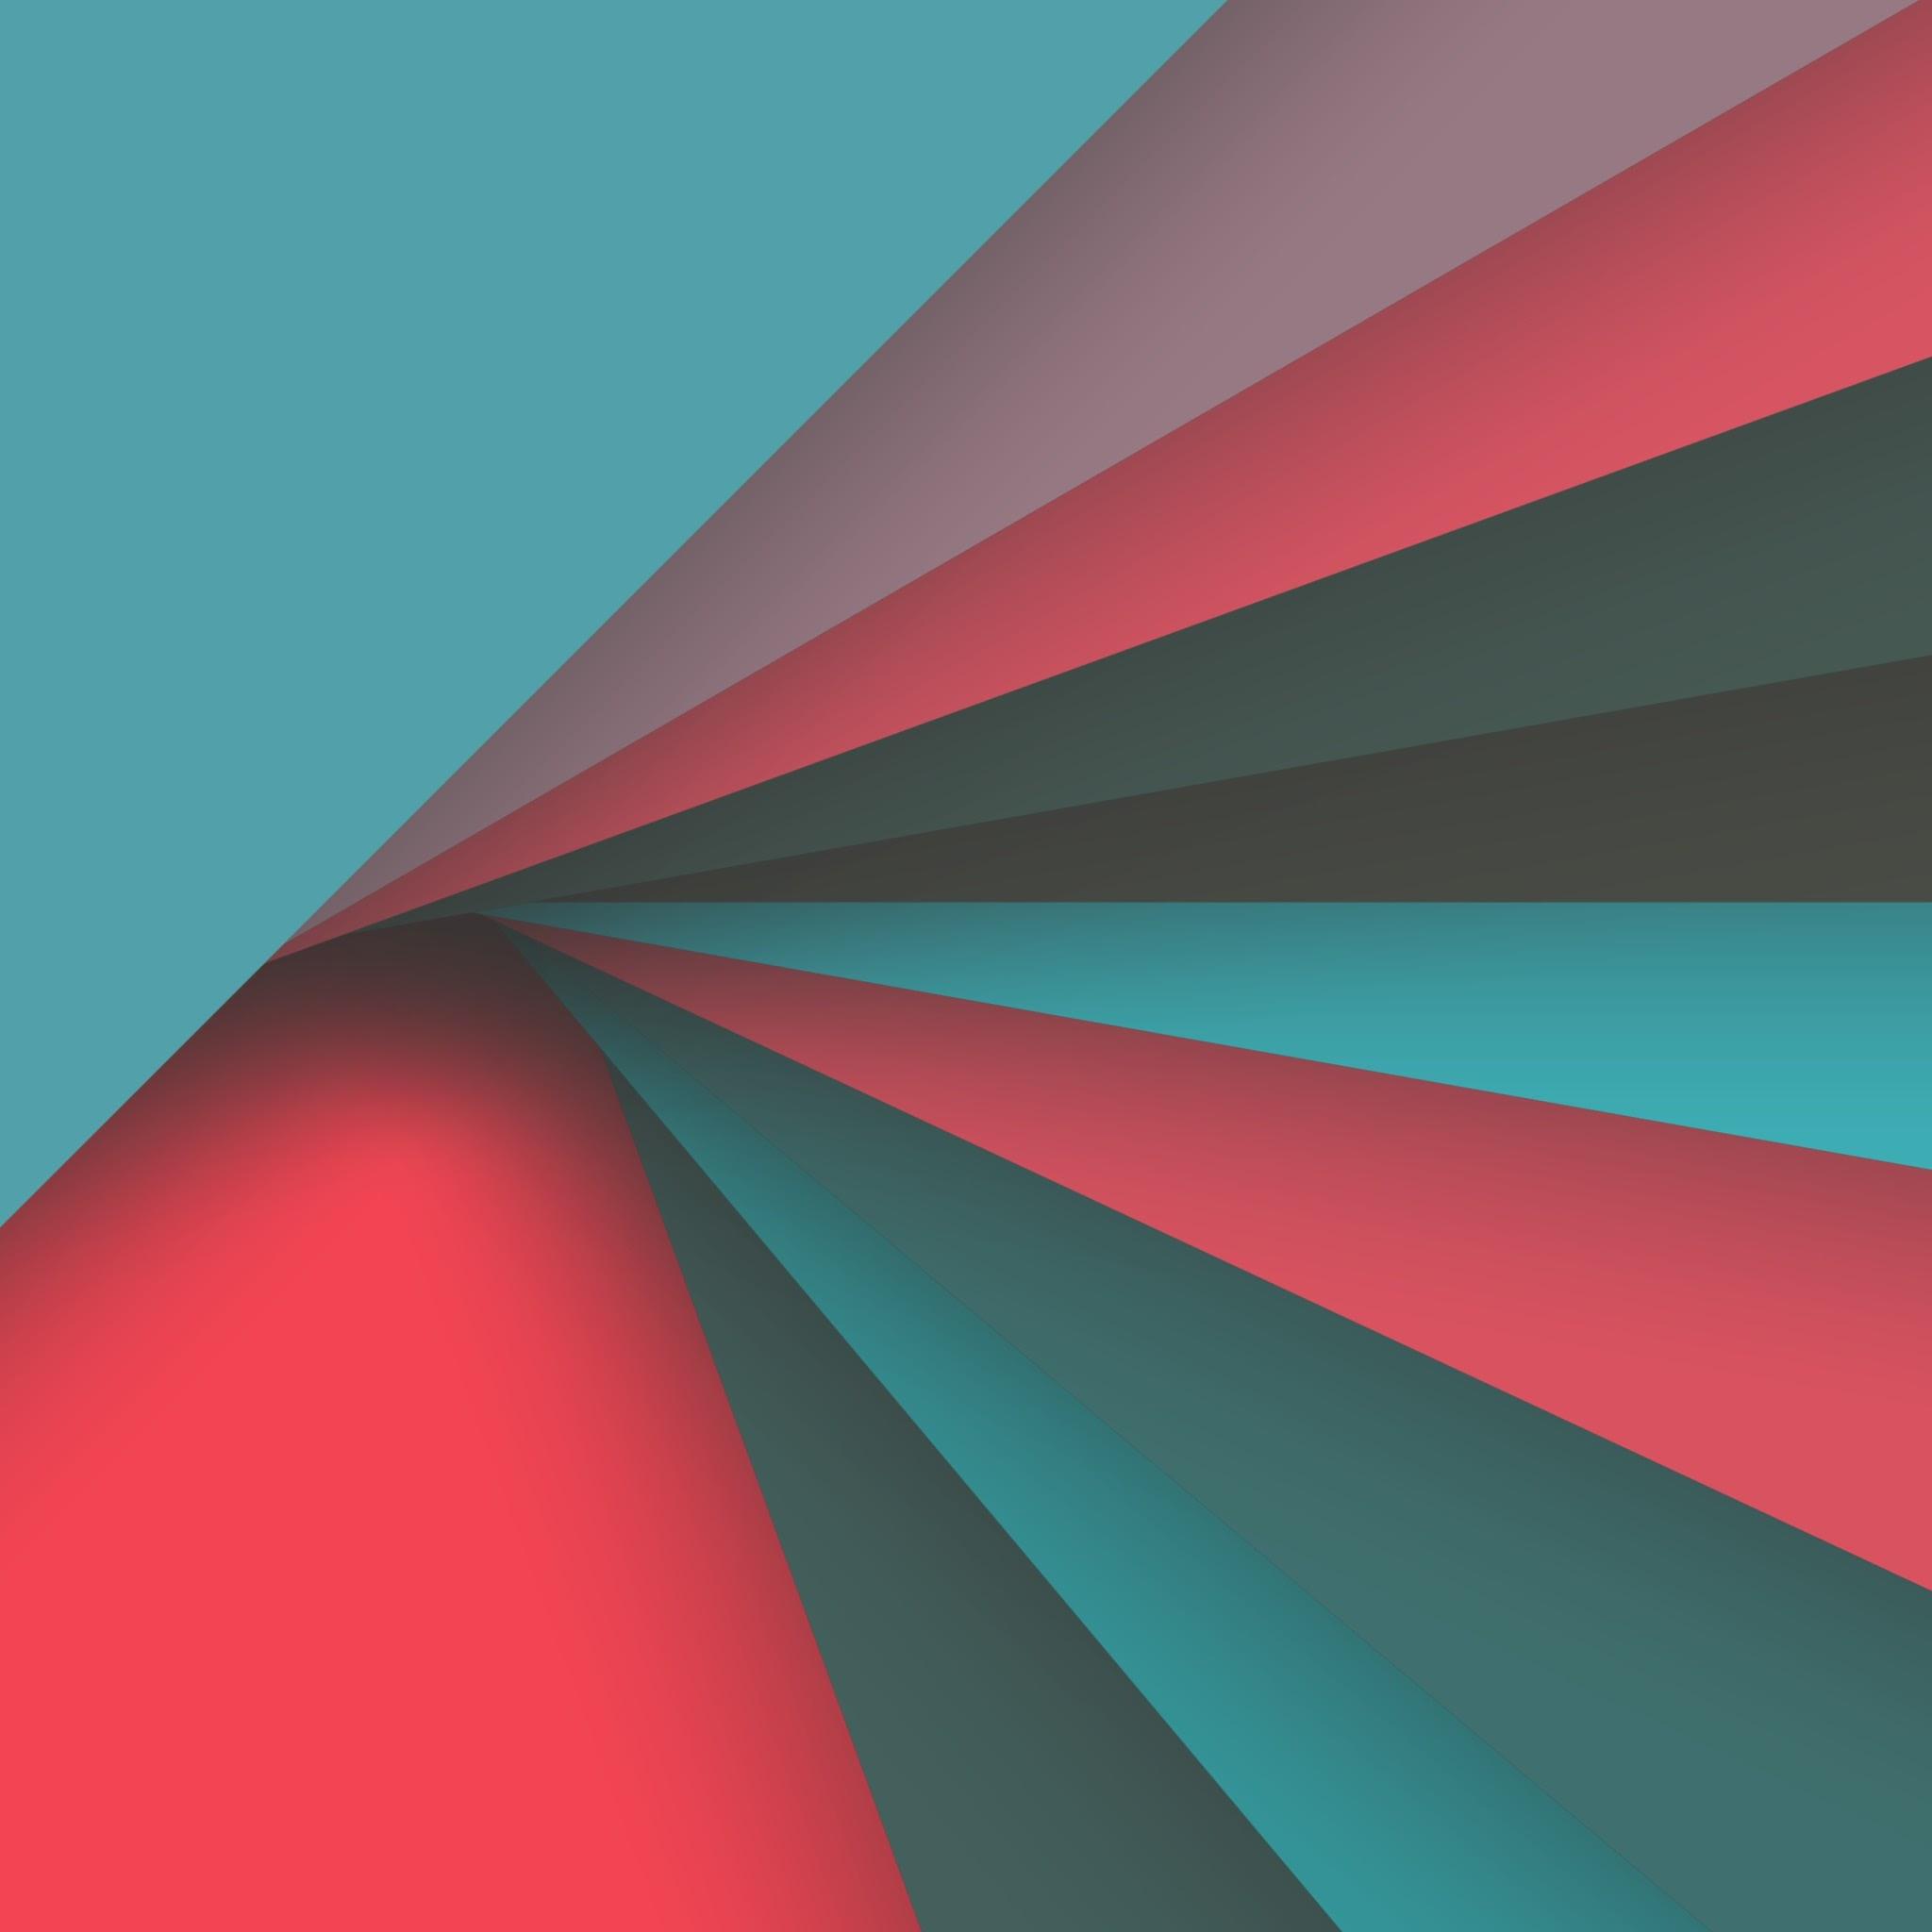 Wellness wallpaper hochkant  Android 5.0 Lollipop: Material Design-Wallpaper zum Download ...